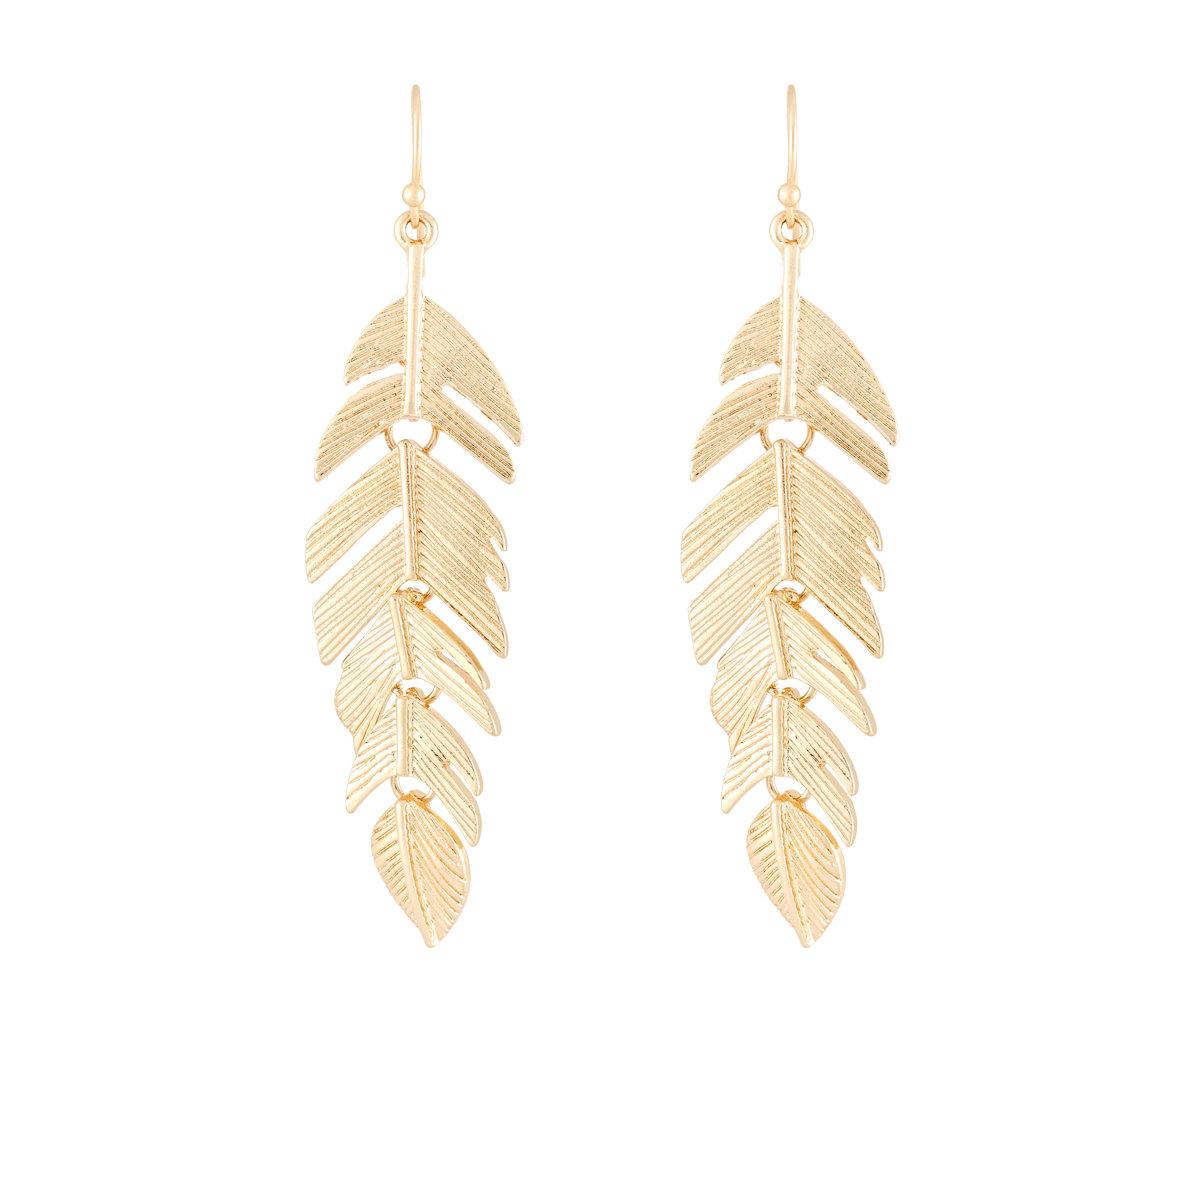 JEWELLERY - Earrings Kenneth Jay Lane QeXukYRf